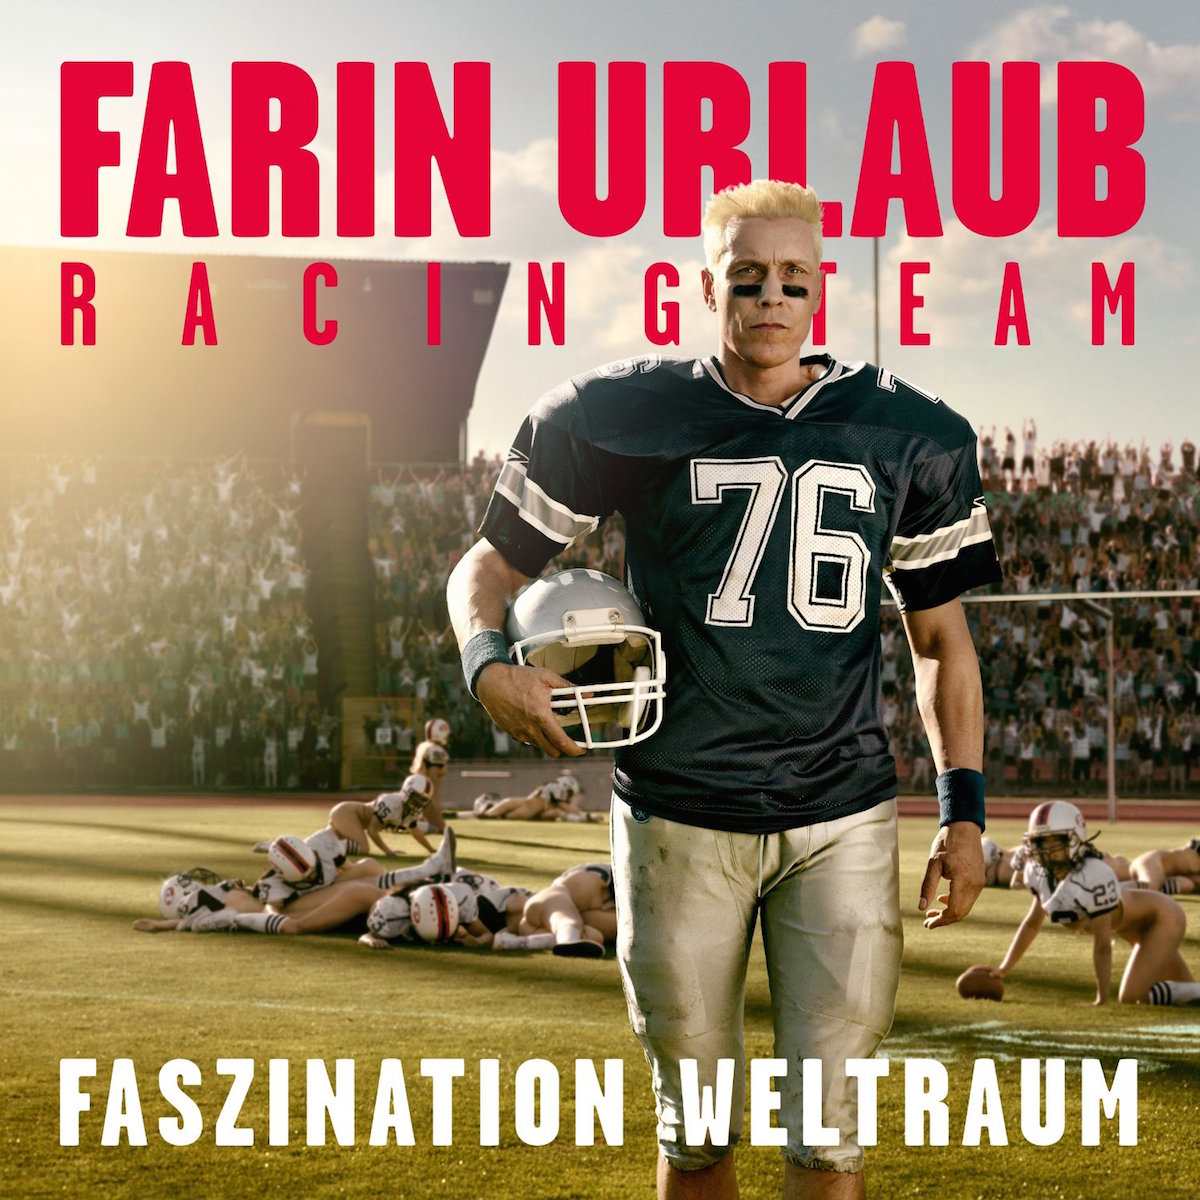 Farin Urlaub Racing Team - Faszination_Weltraum